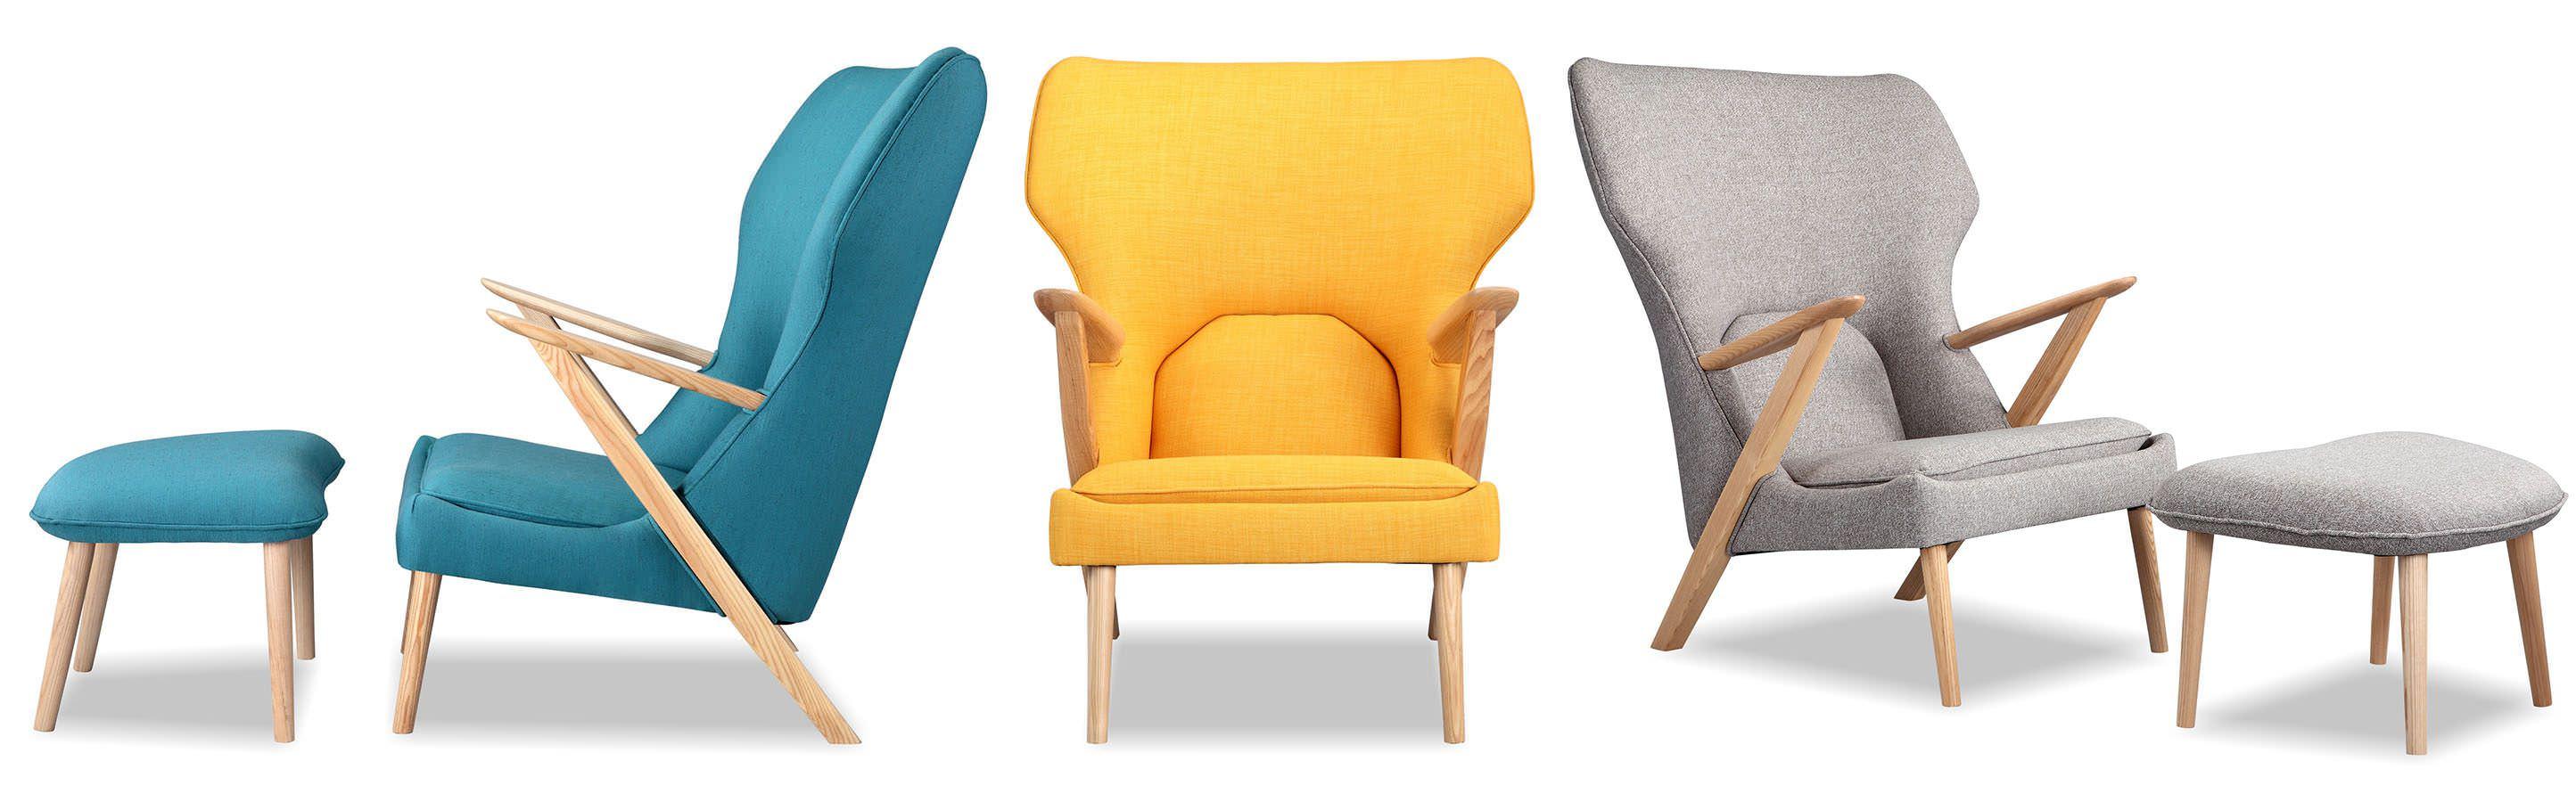 Cub Mid Century Modern Chair & Ottoman